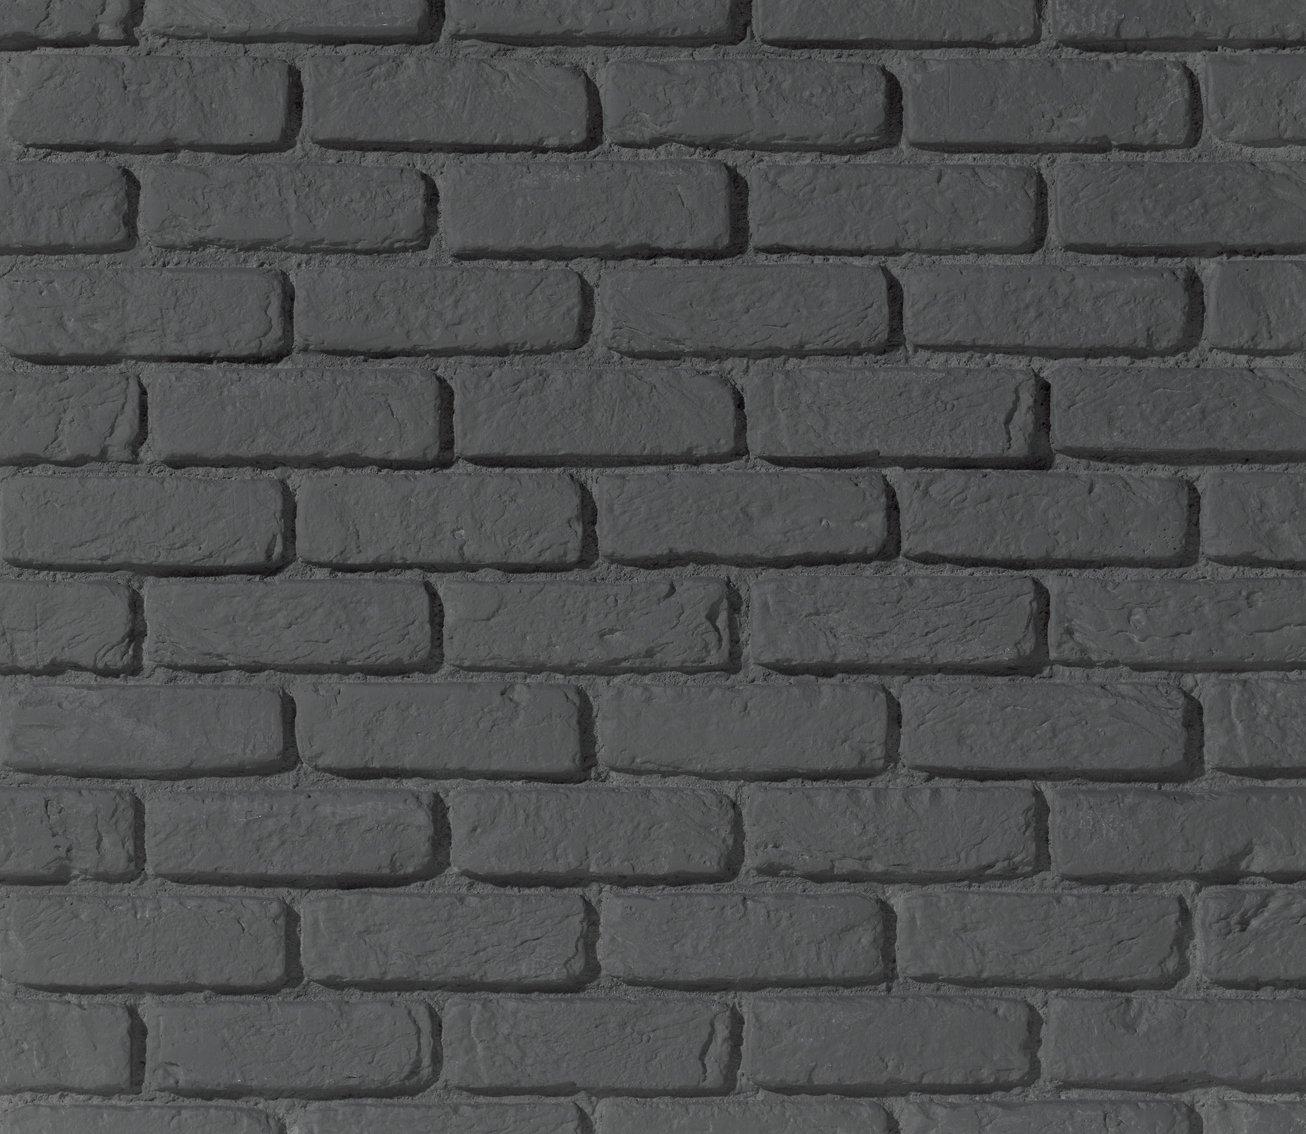 PX 084 9005 Urban Brick